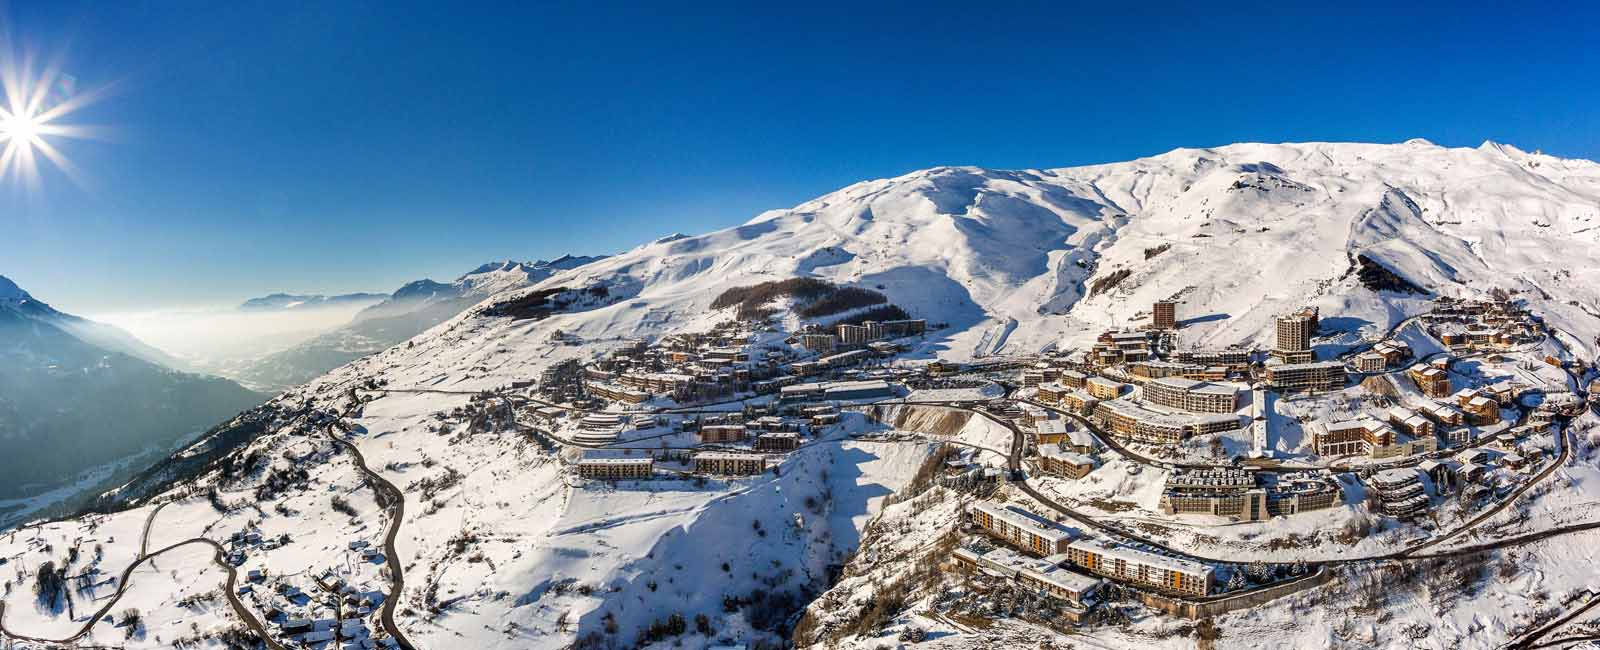 Station de ski Orcières Merlette